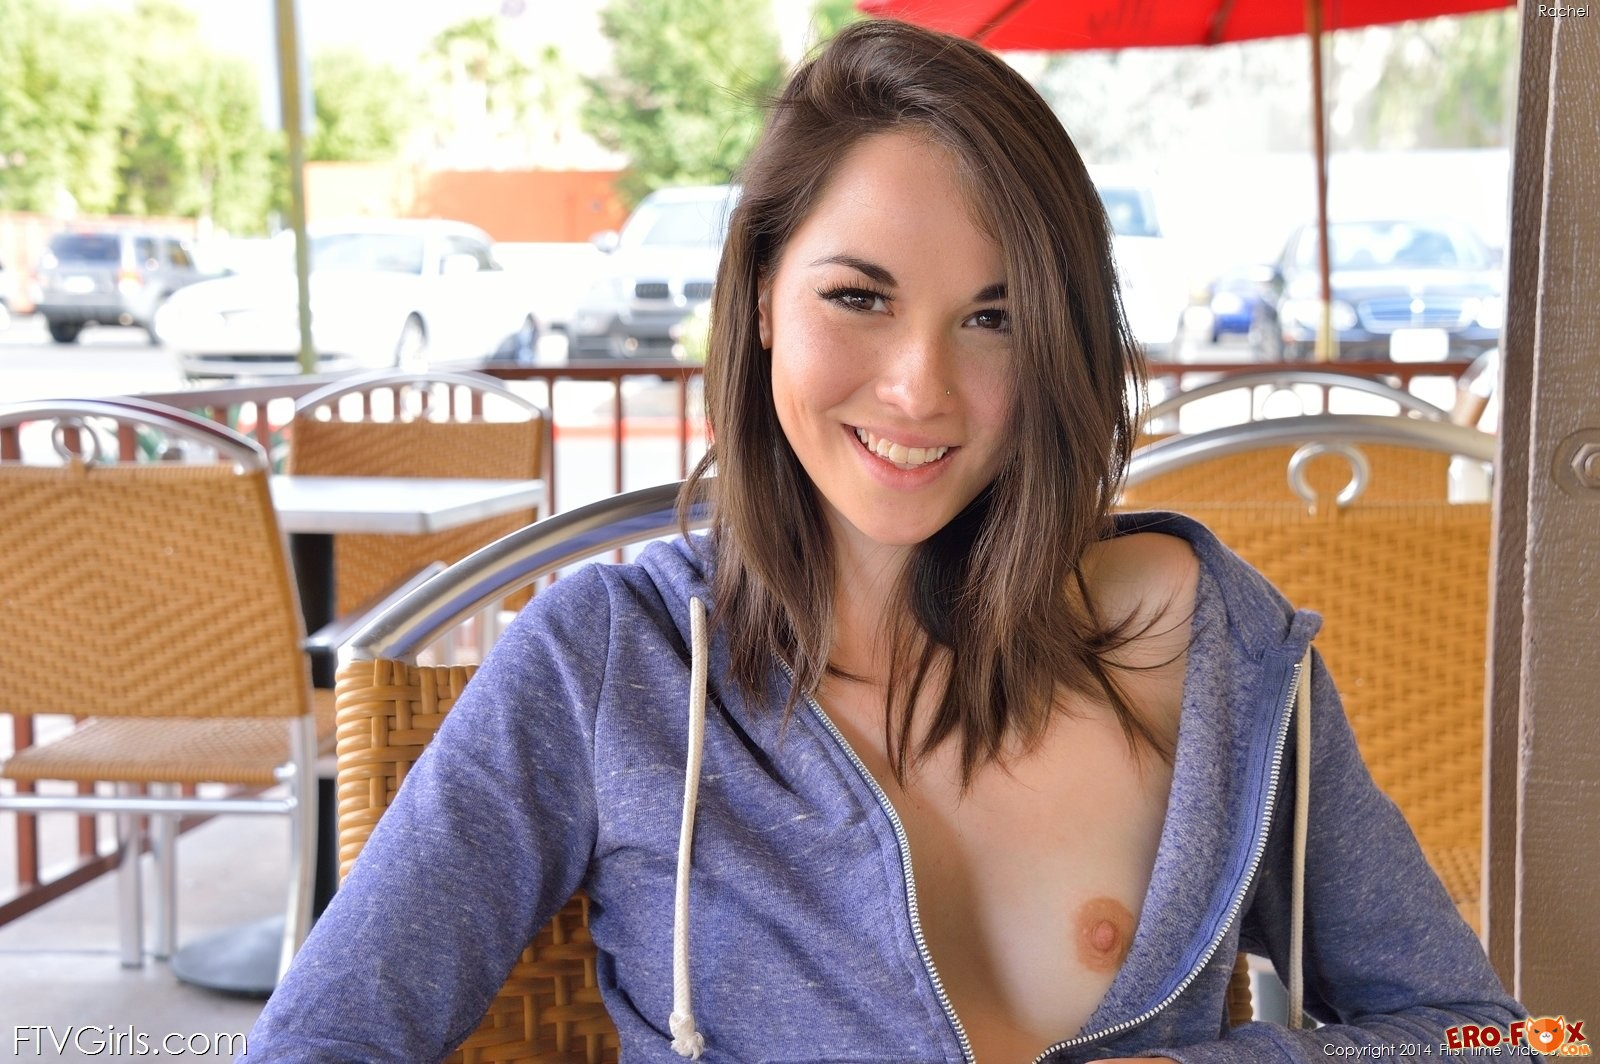 Фото девушки со спущенными трусиками - голая попа.